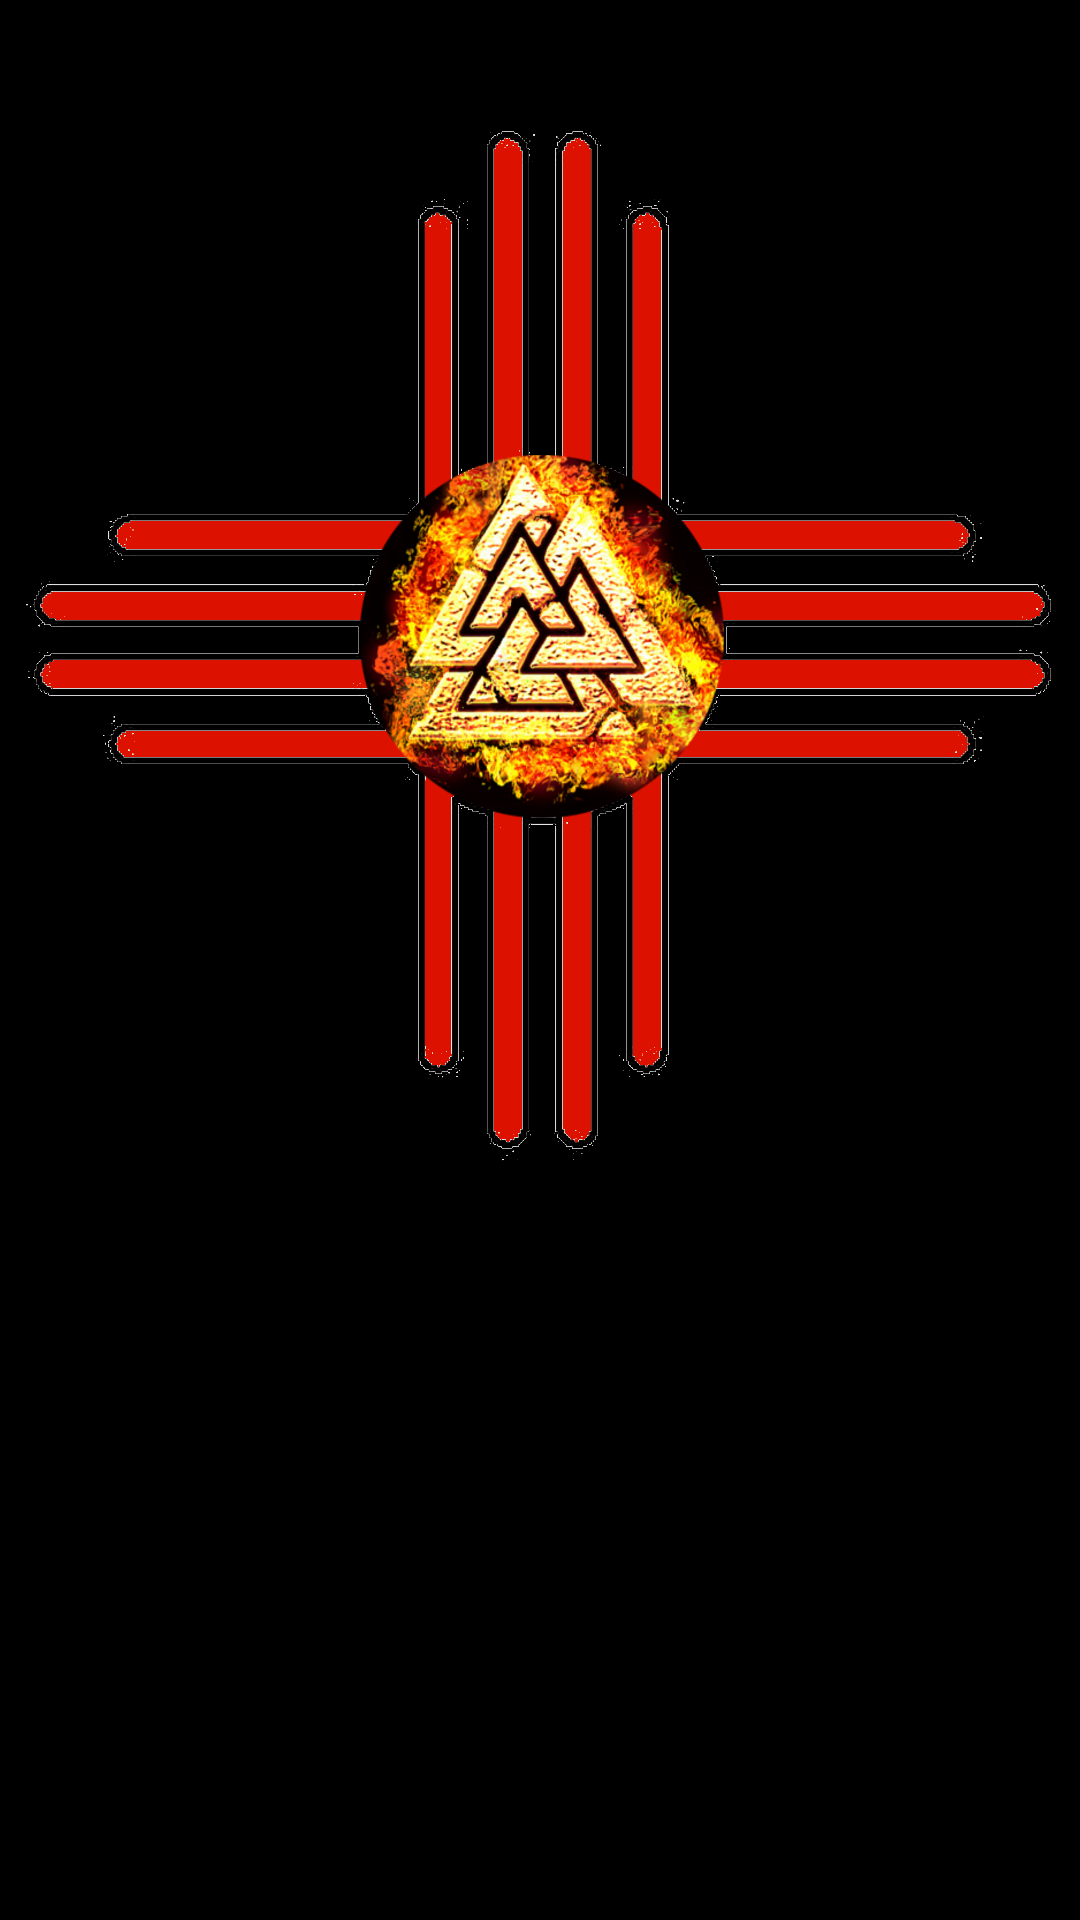 Native American Zia Nordic Valknut Fire West Art New Mexico Southwest Usa